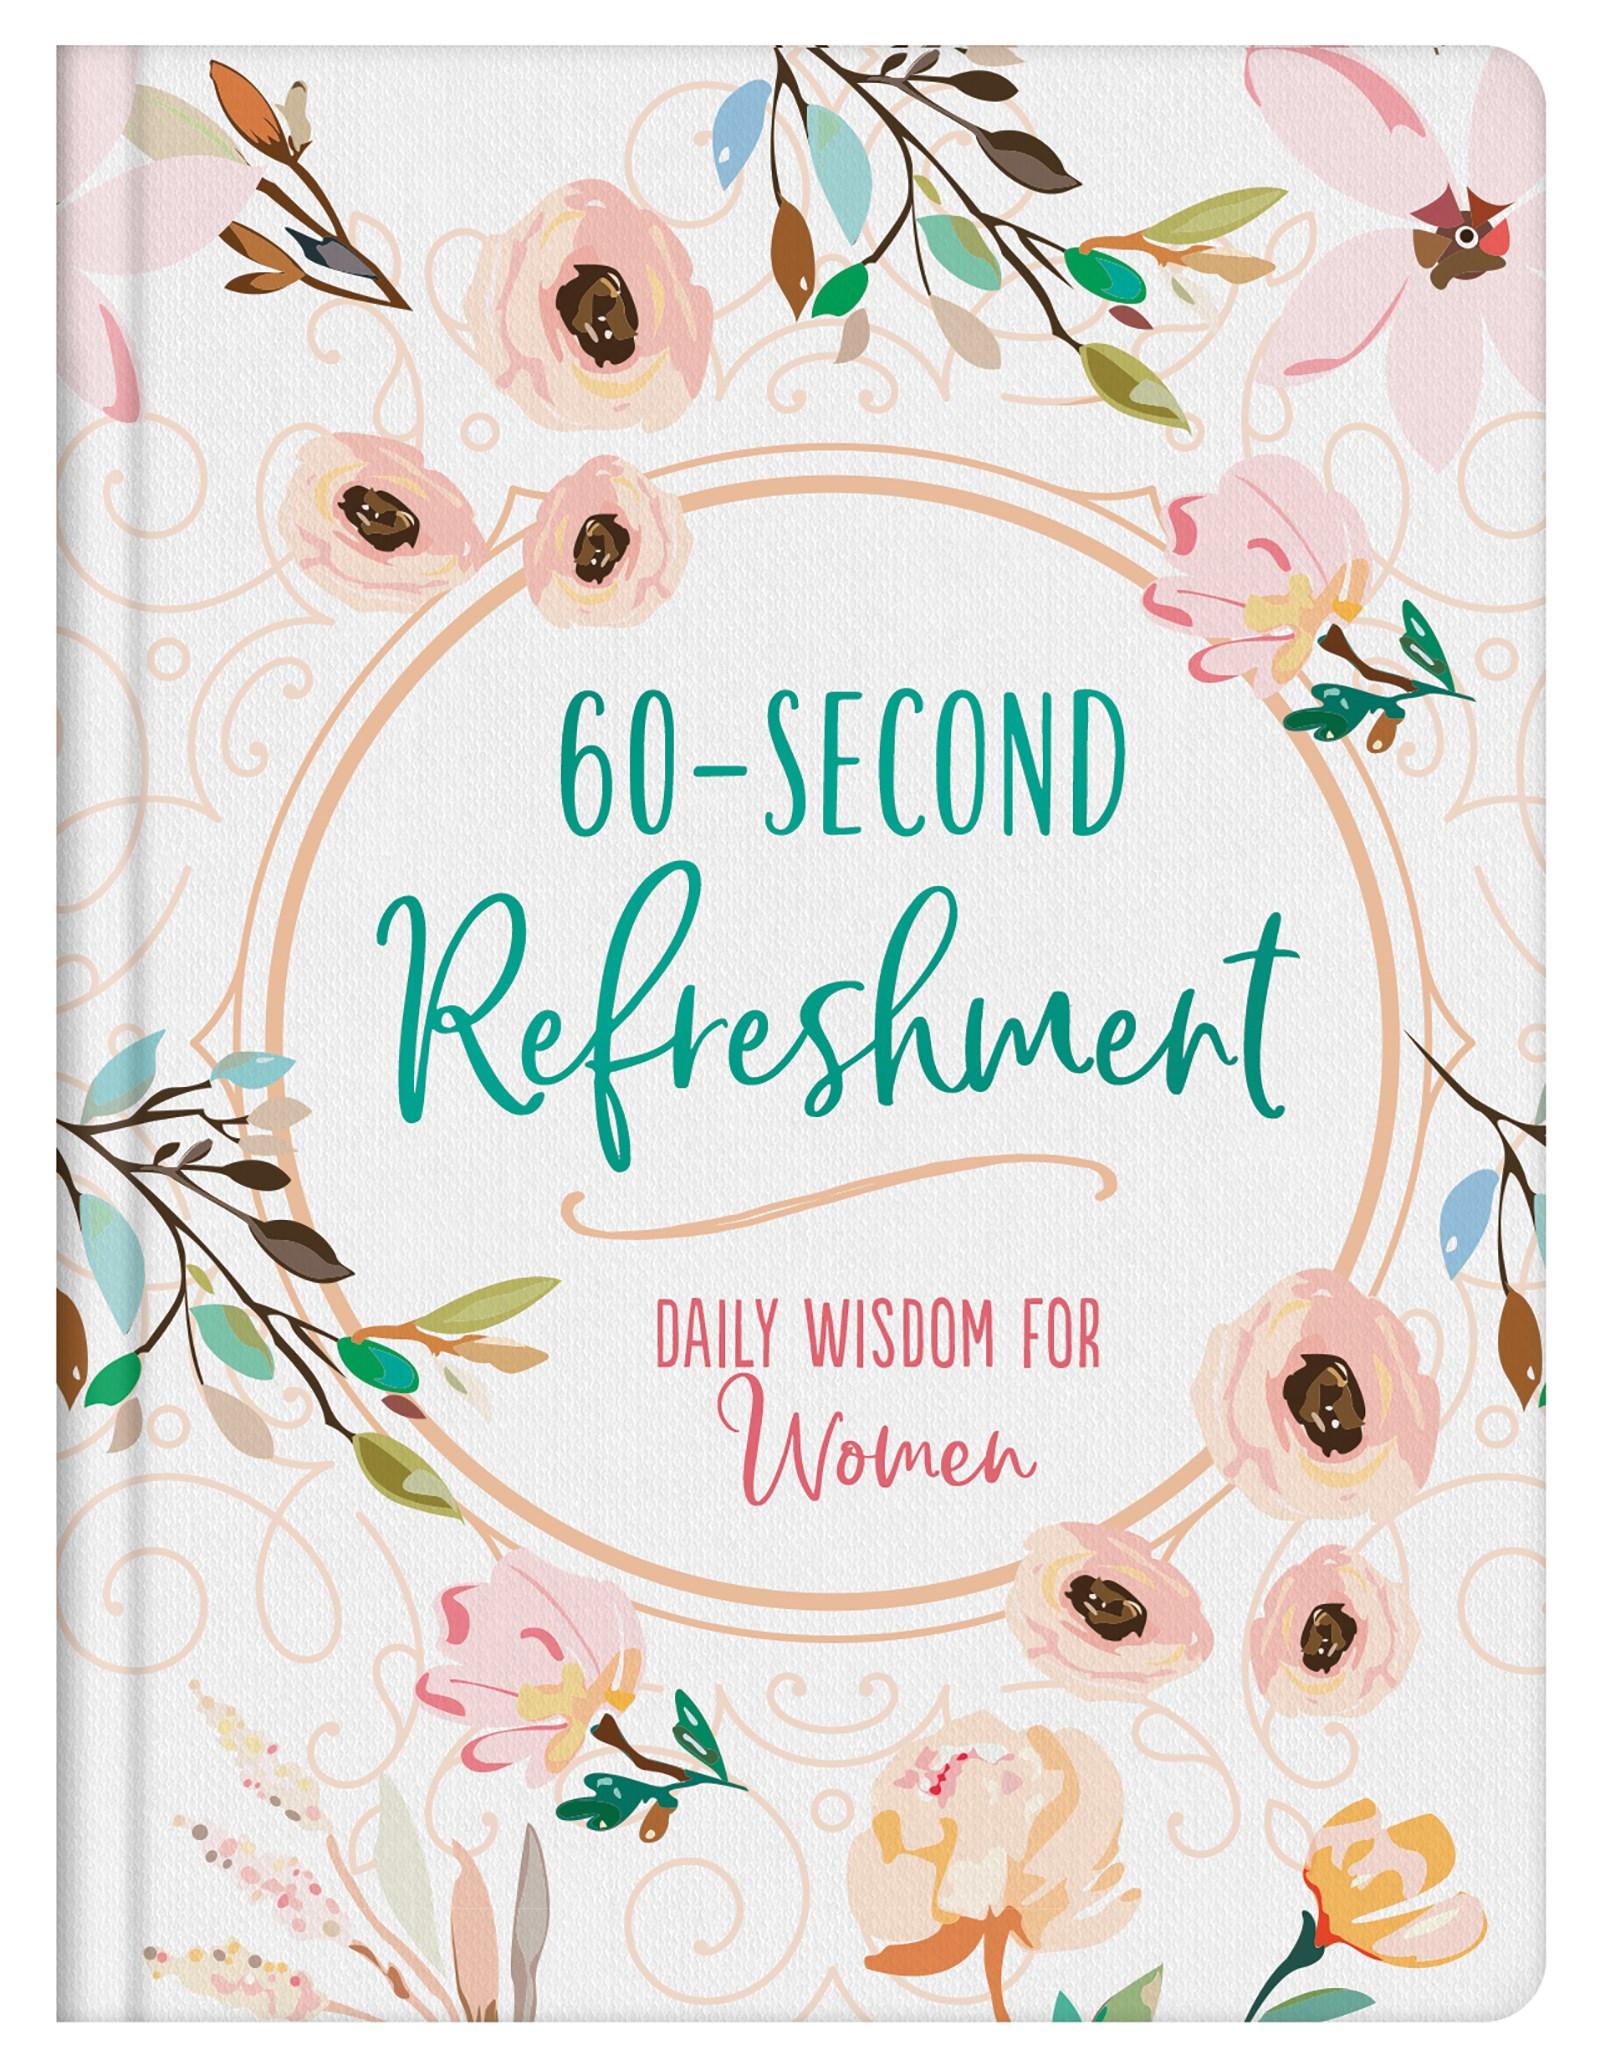 60-Second Refreshment: Daily Wisdom For Women